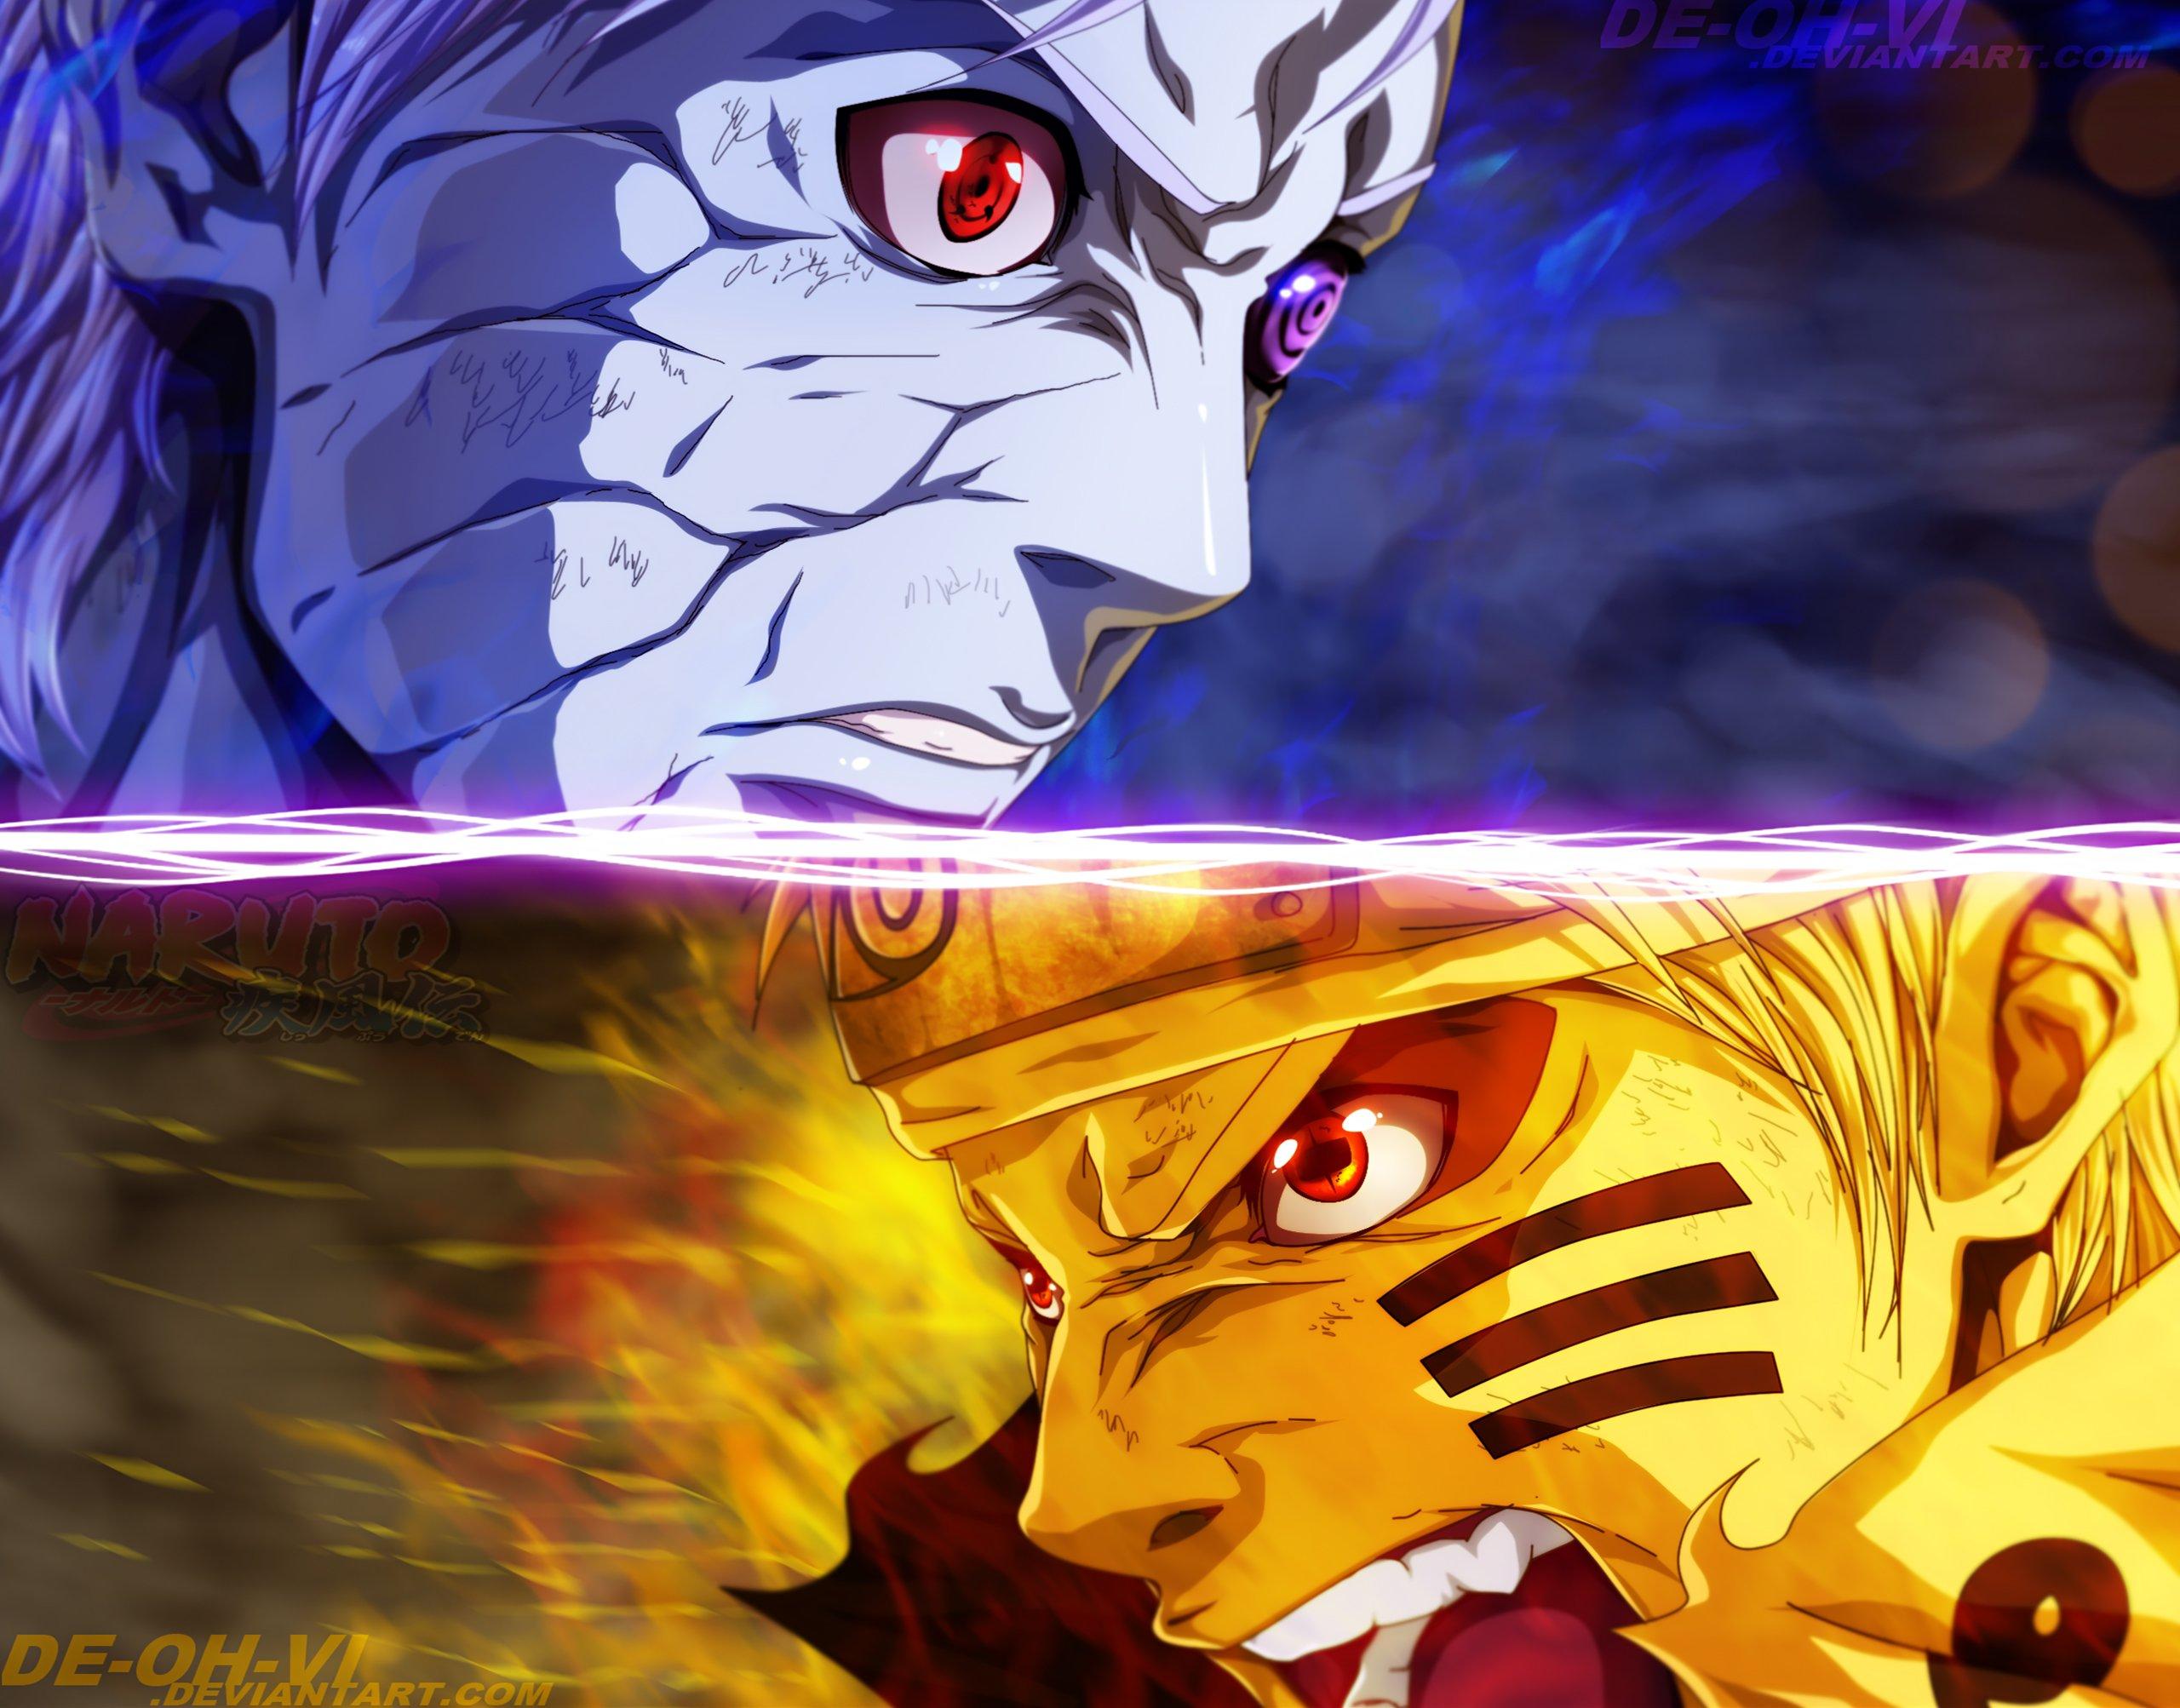 Fondos de pantalla Anime Obito Uchiha contra Naruto Uzumaki